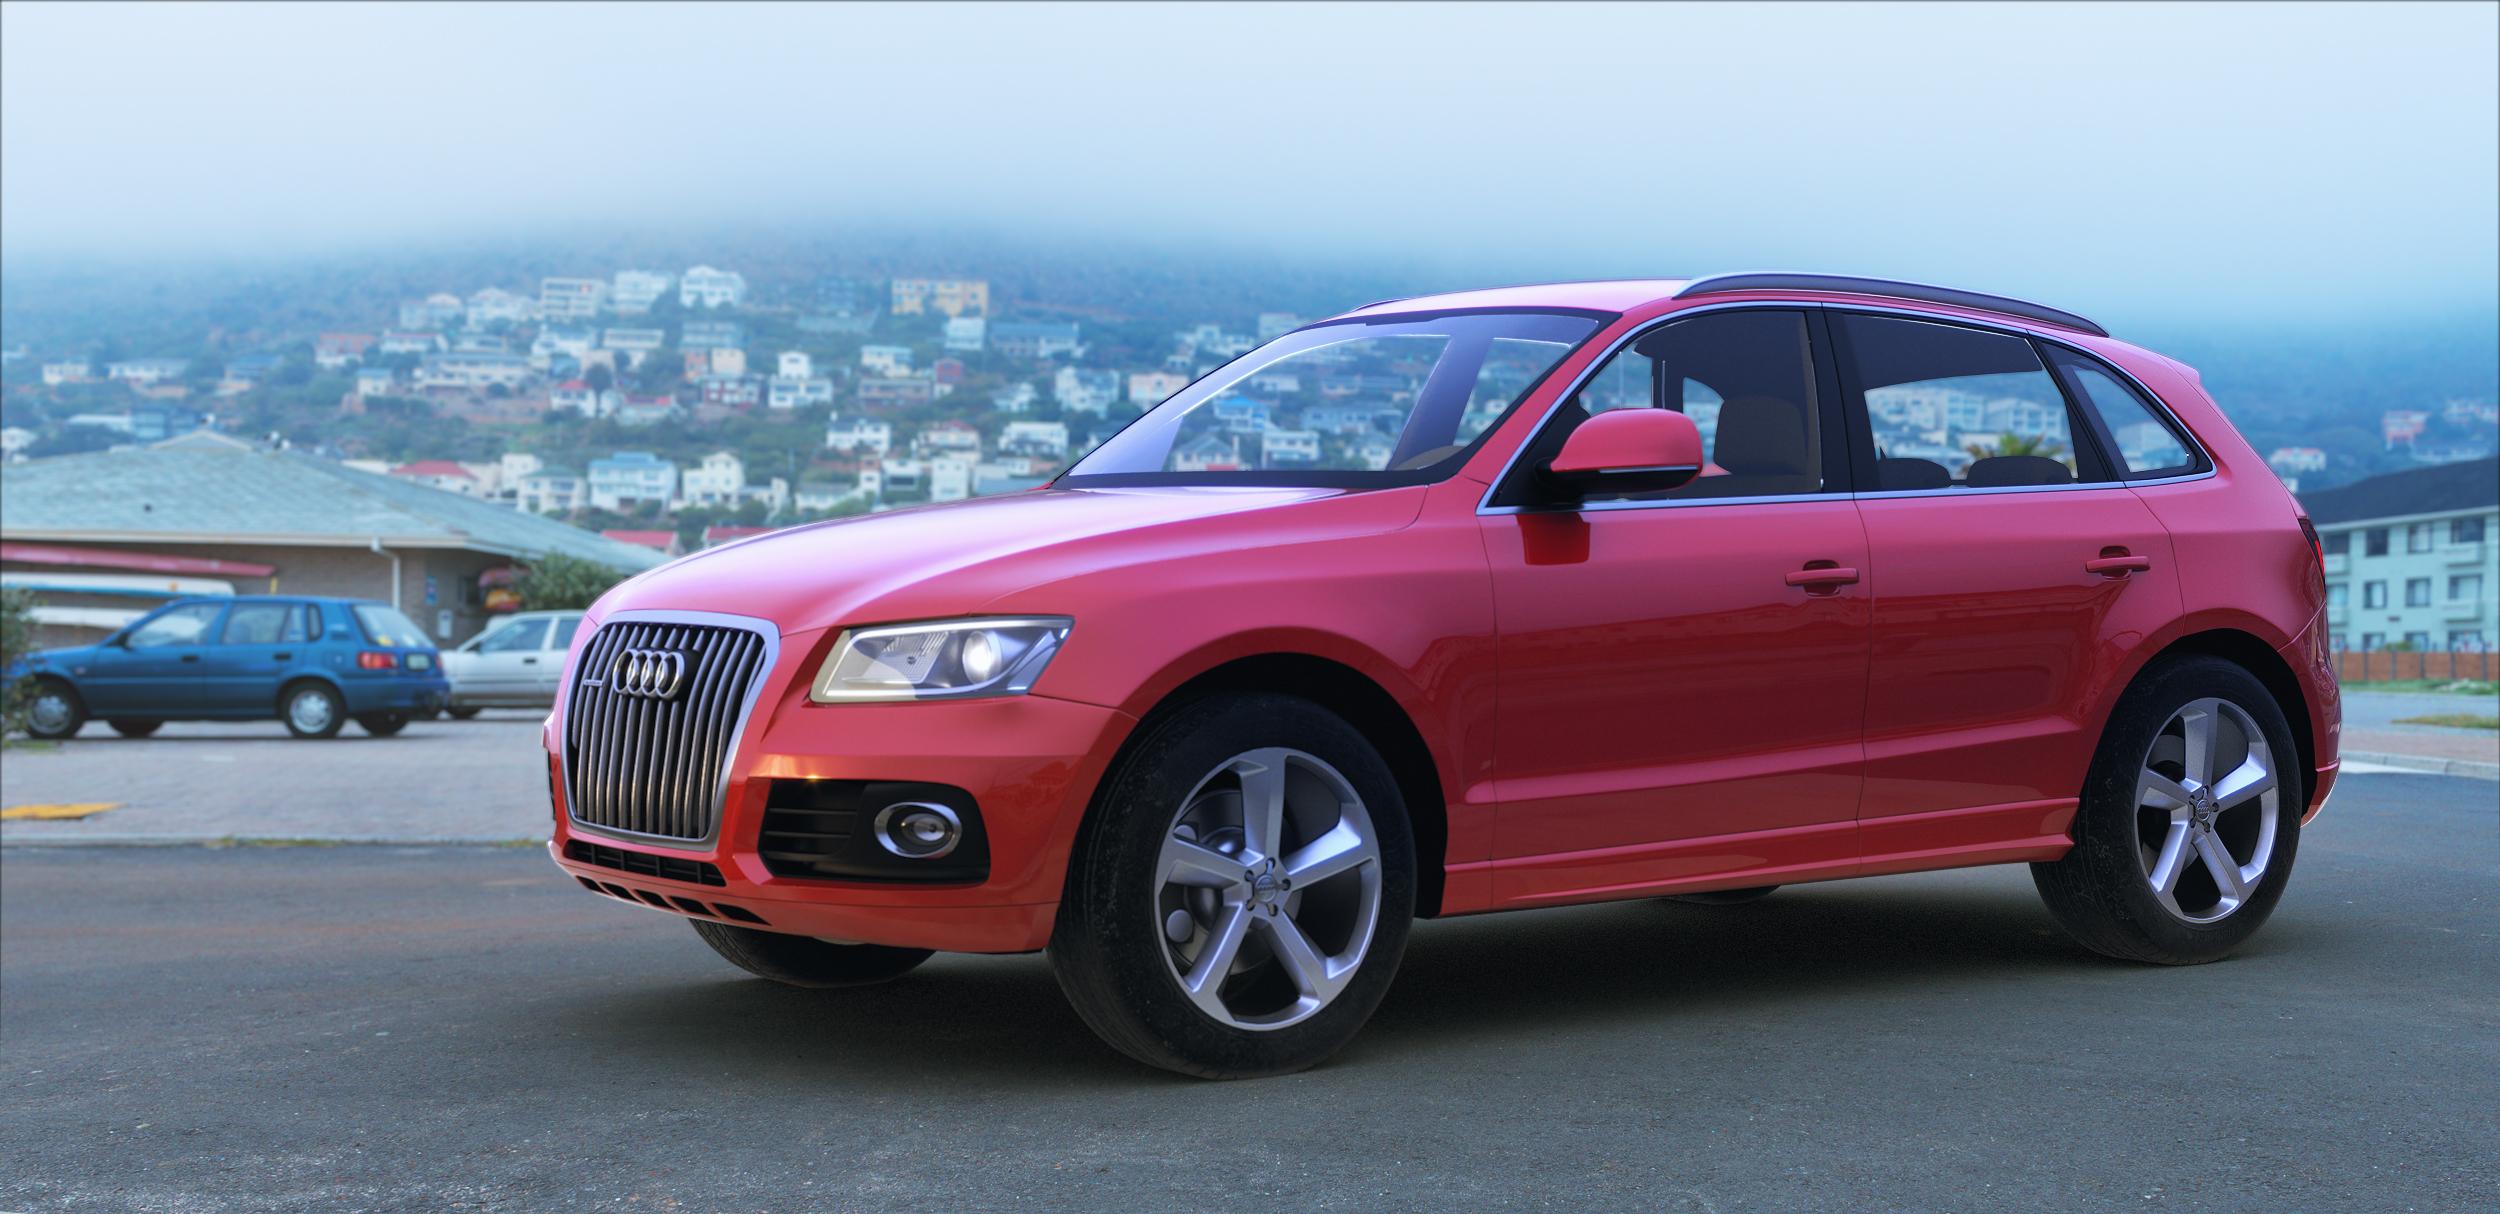 Audi_Q5_2.effectsResult_[8]_00.jpg